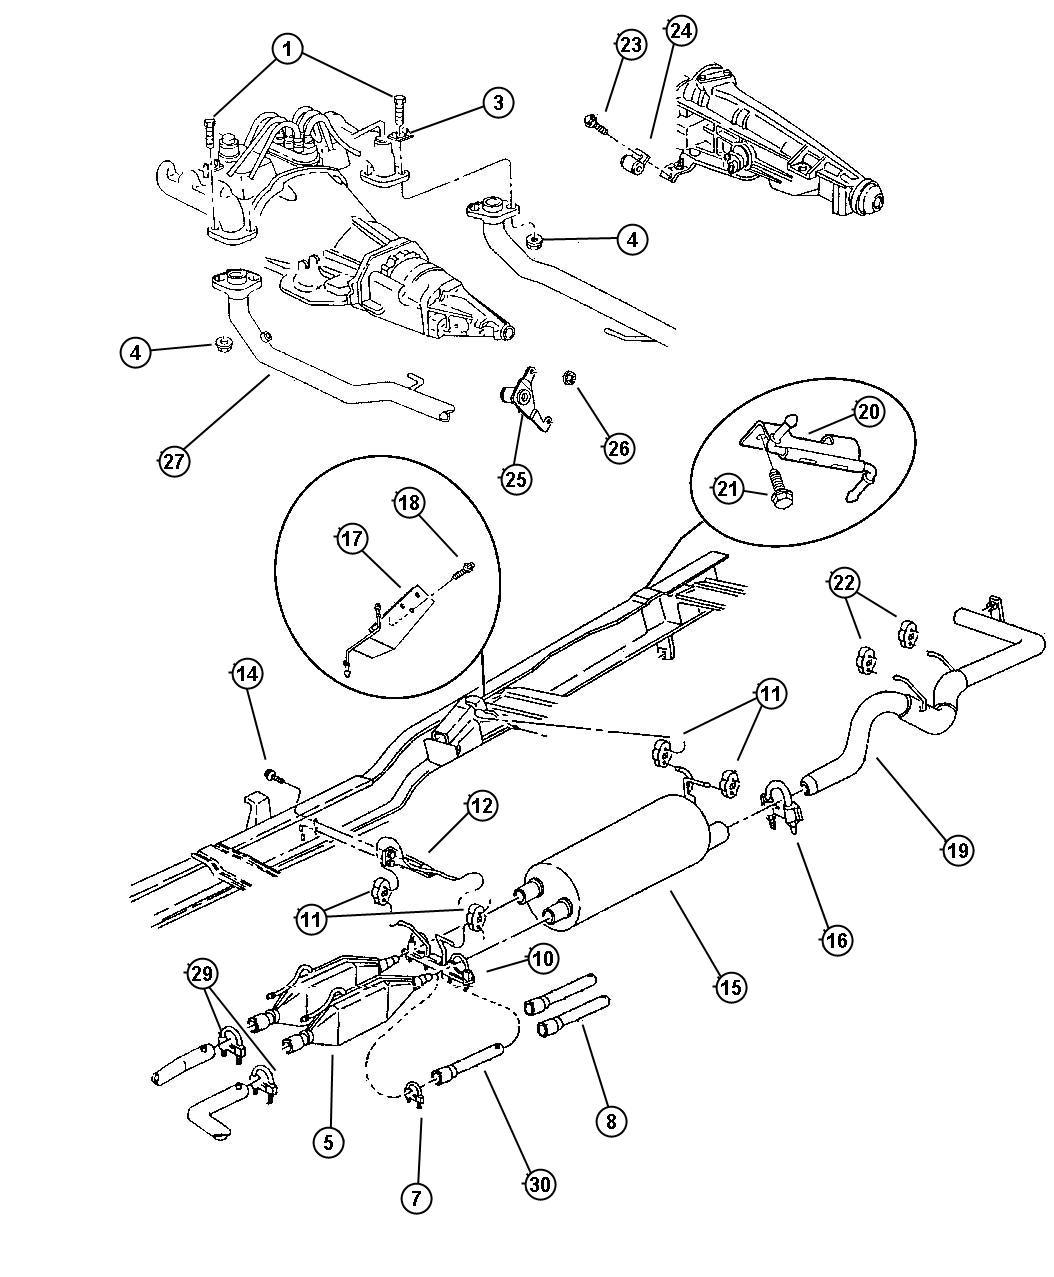 Dodge Ram 3500 Insulator. Exhaust. Ton, metric, enc